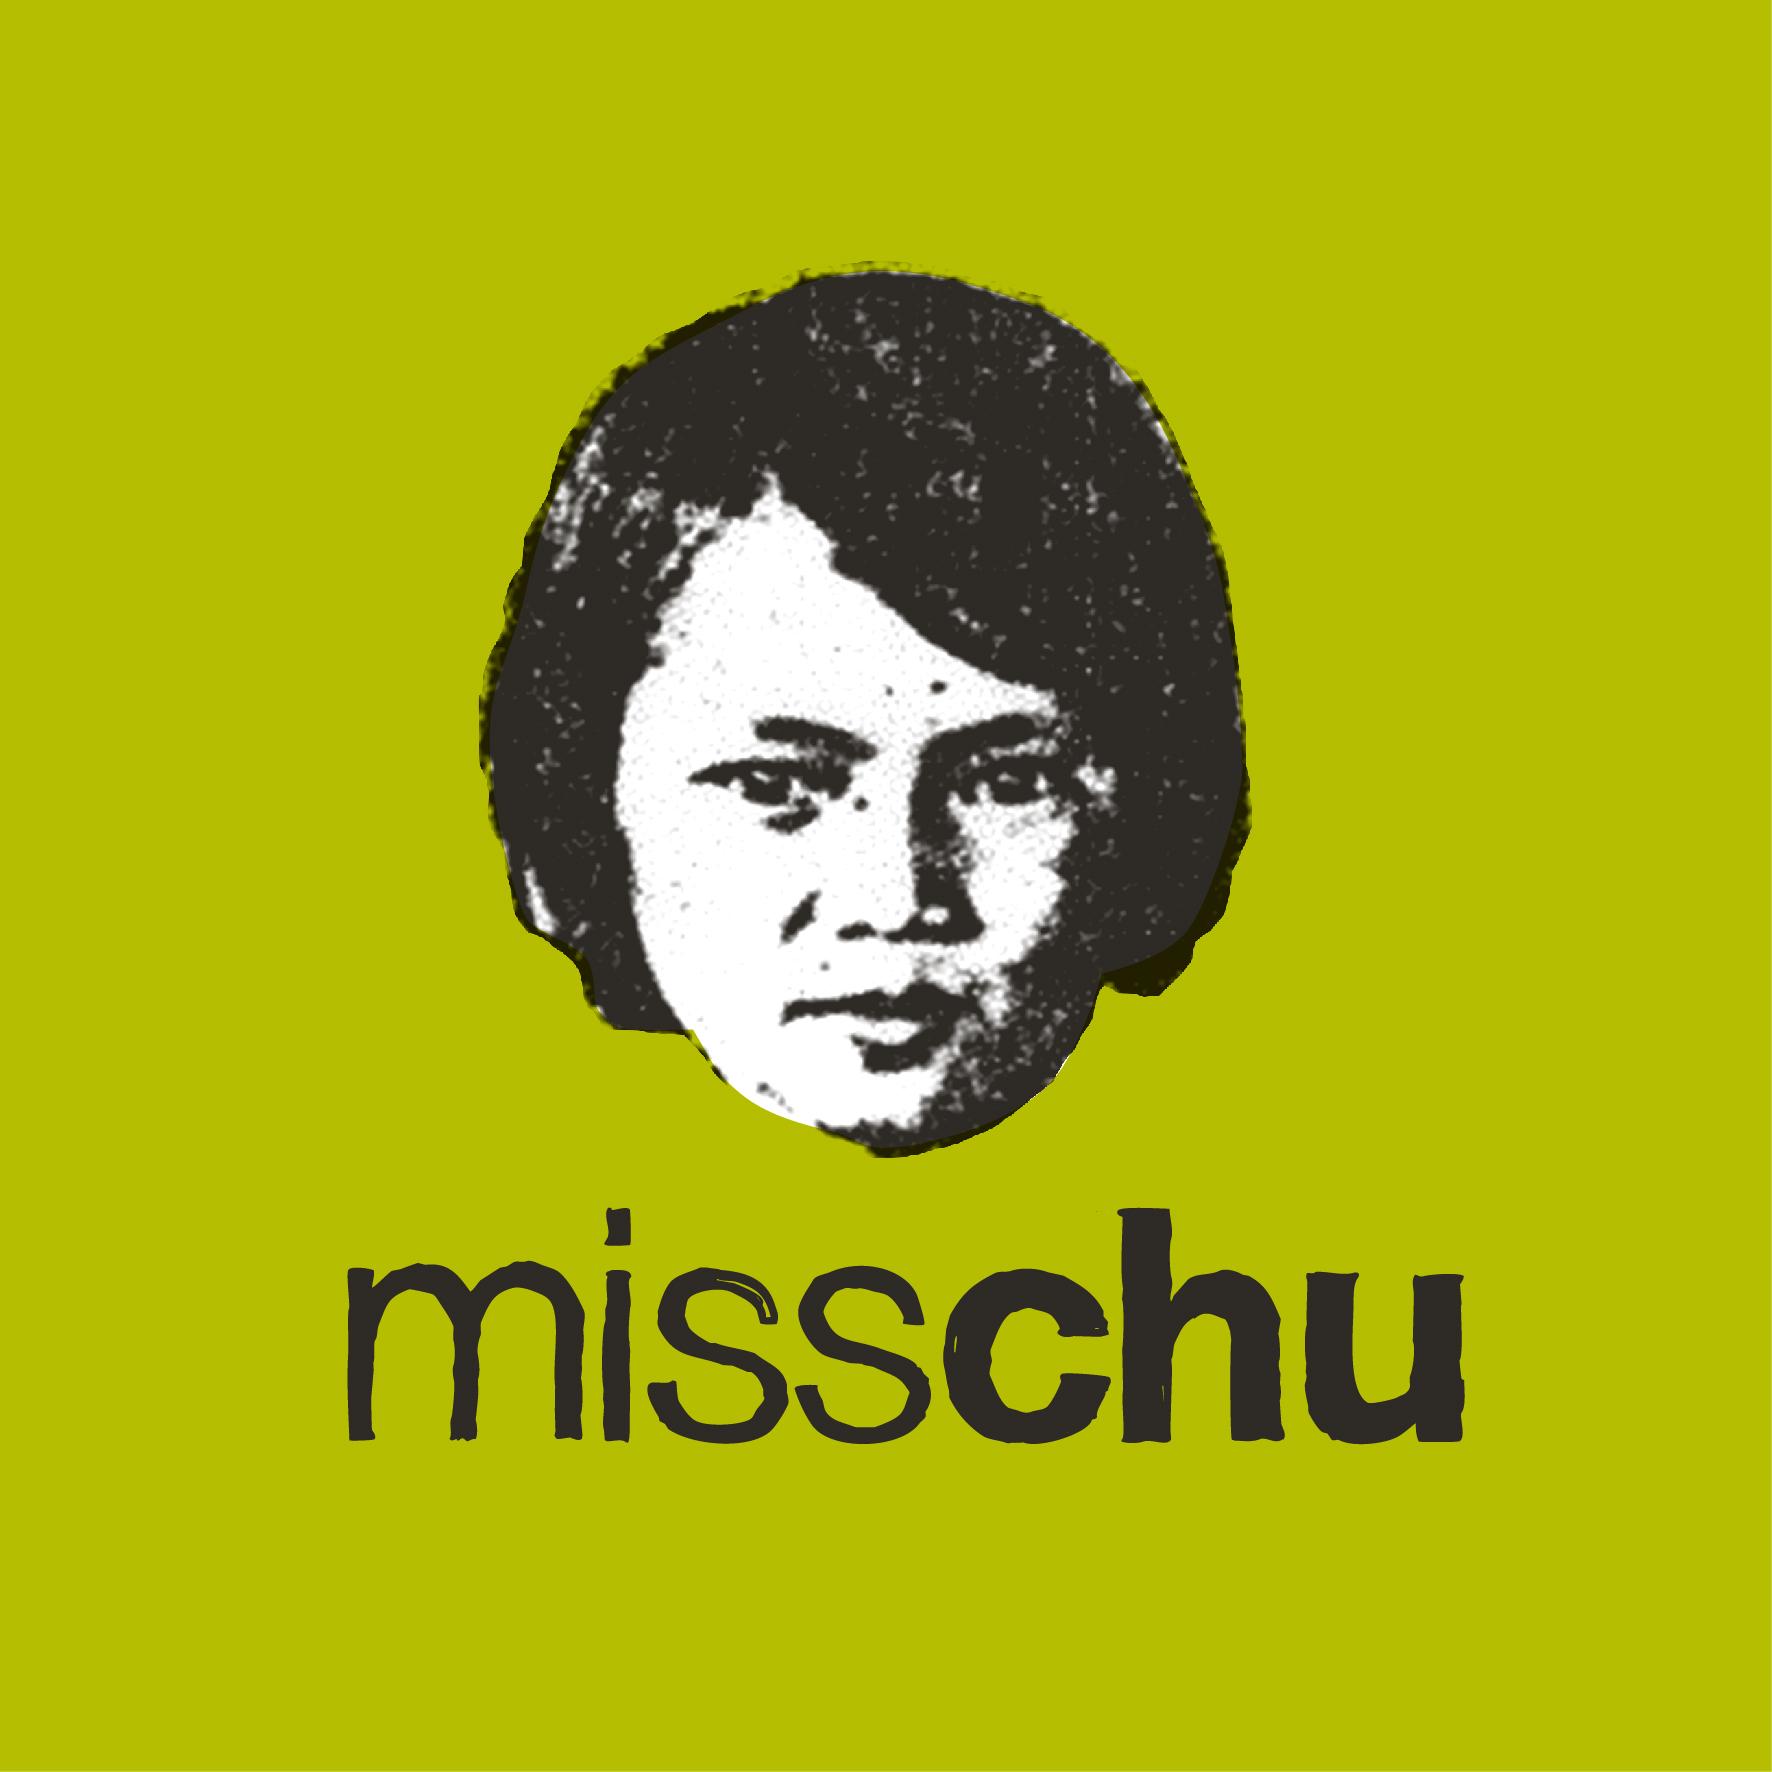 misschu the original Asian street-food 'tuckshop' - New franchise Canberra